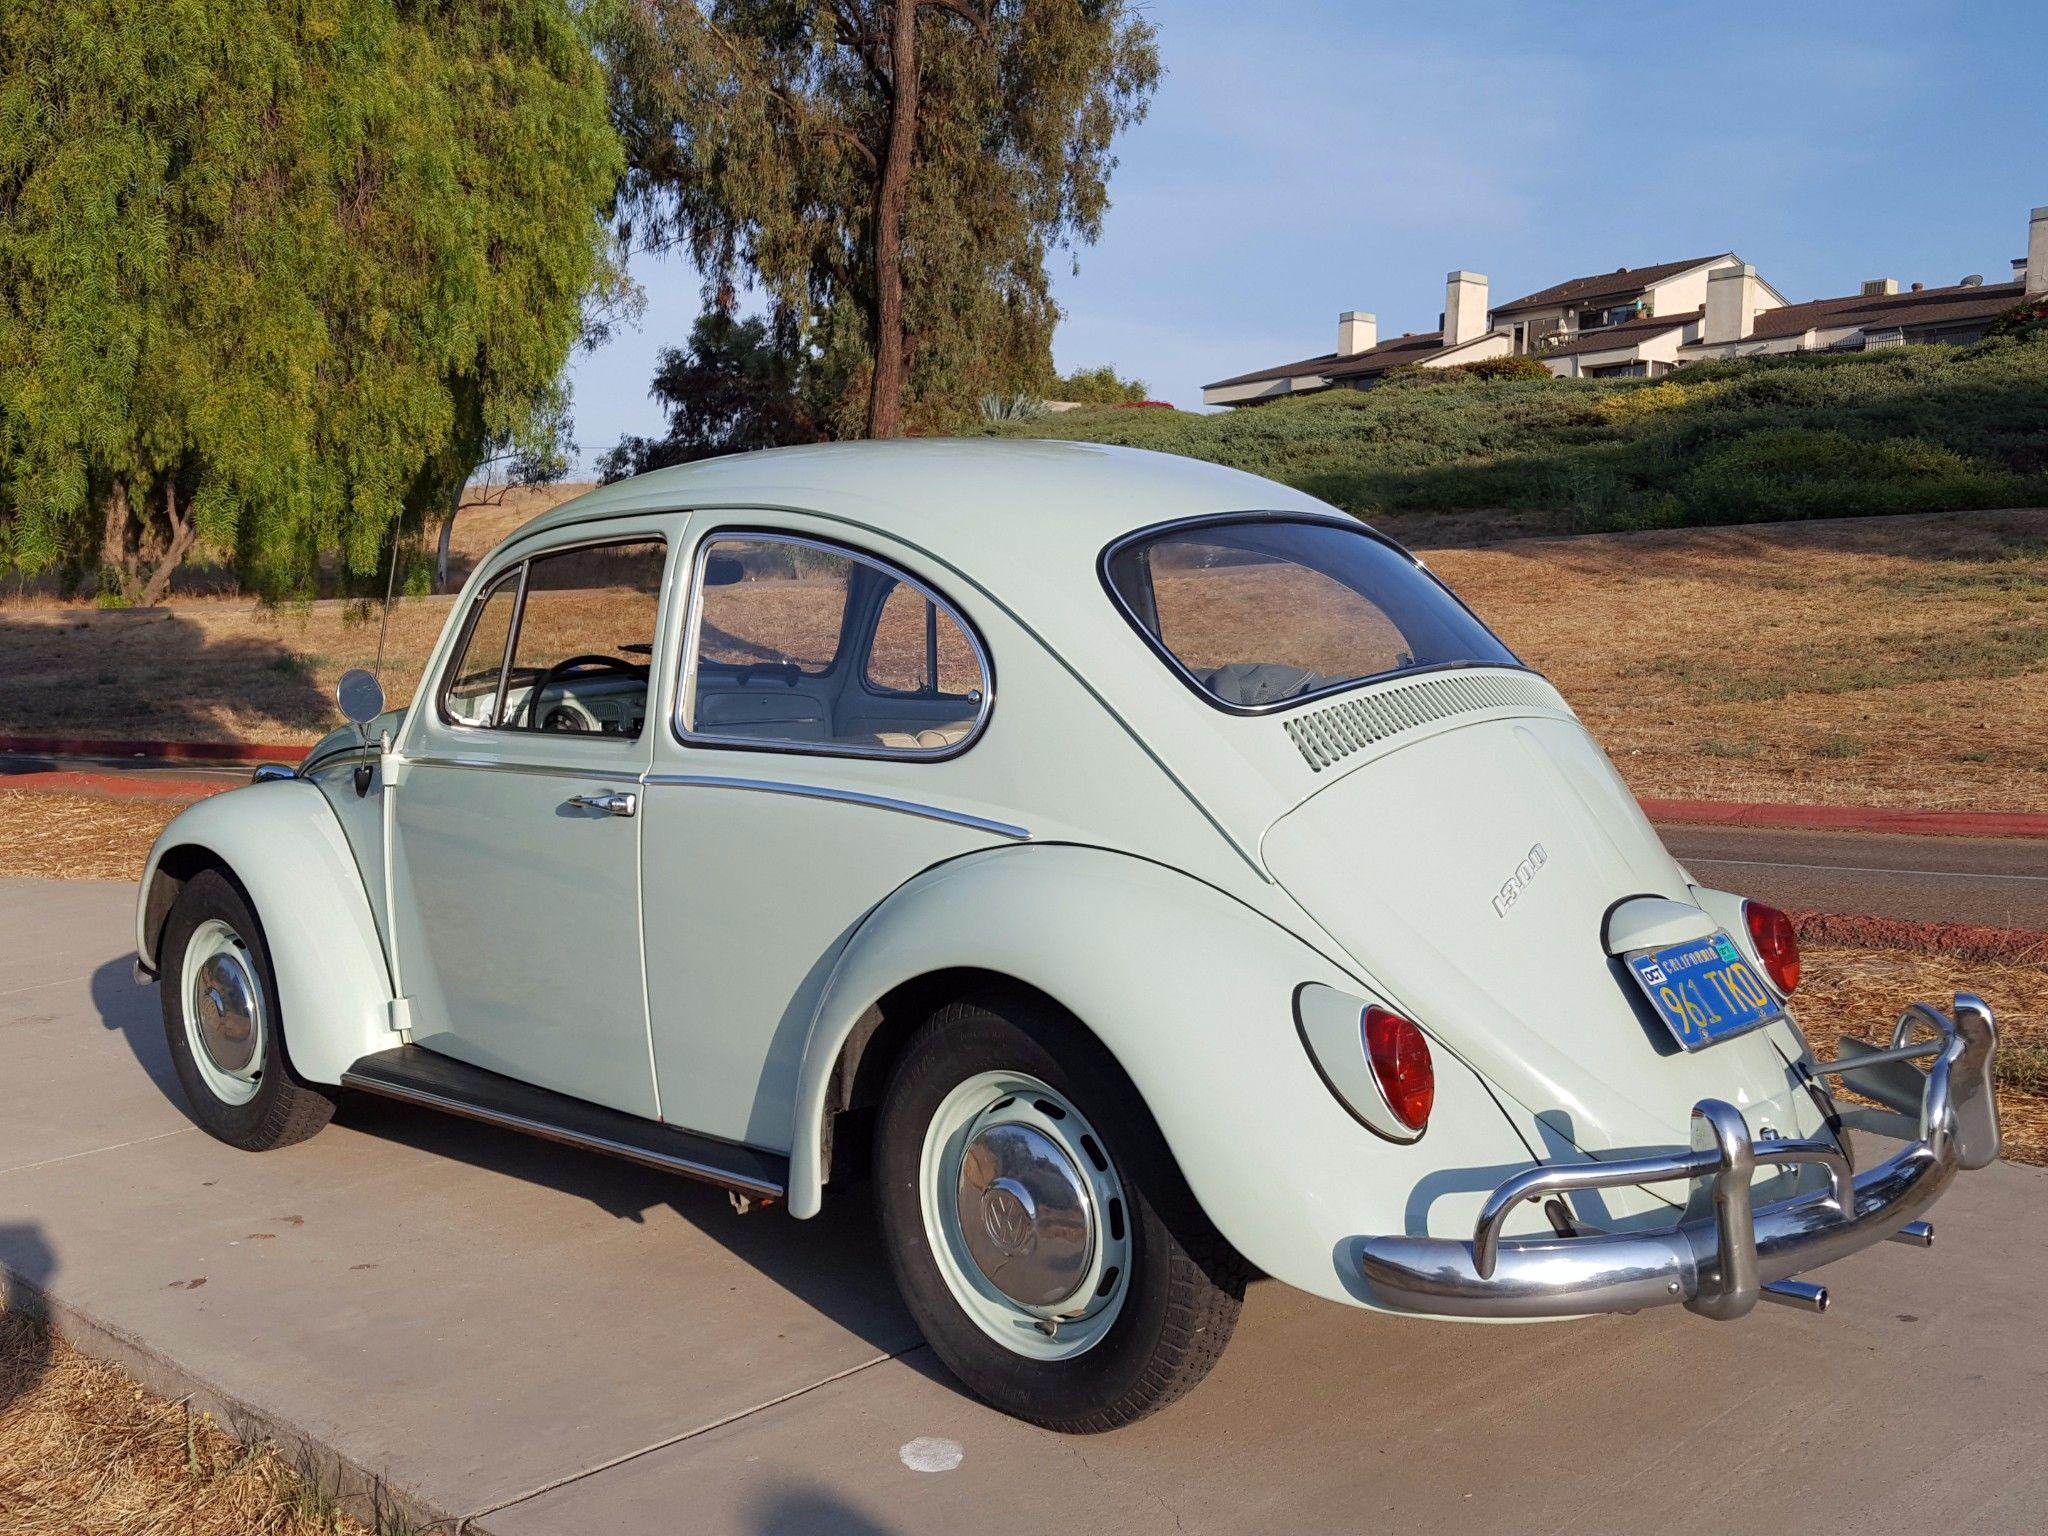 ragtop photo beaverton bugs classic coupe vehicle details or volkswagen beetle